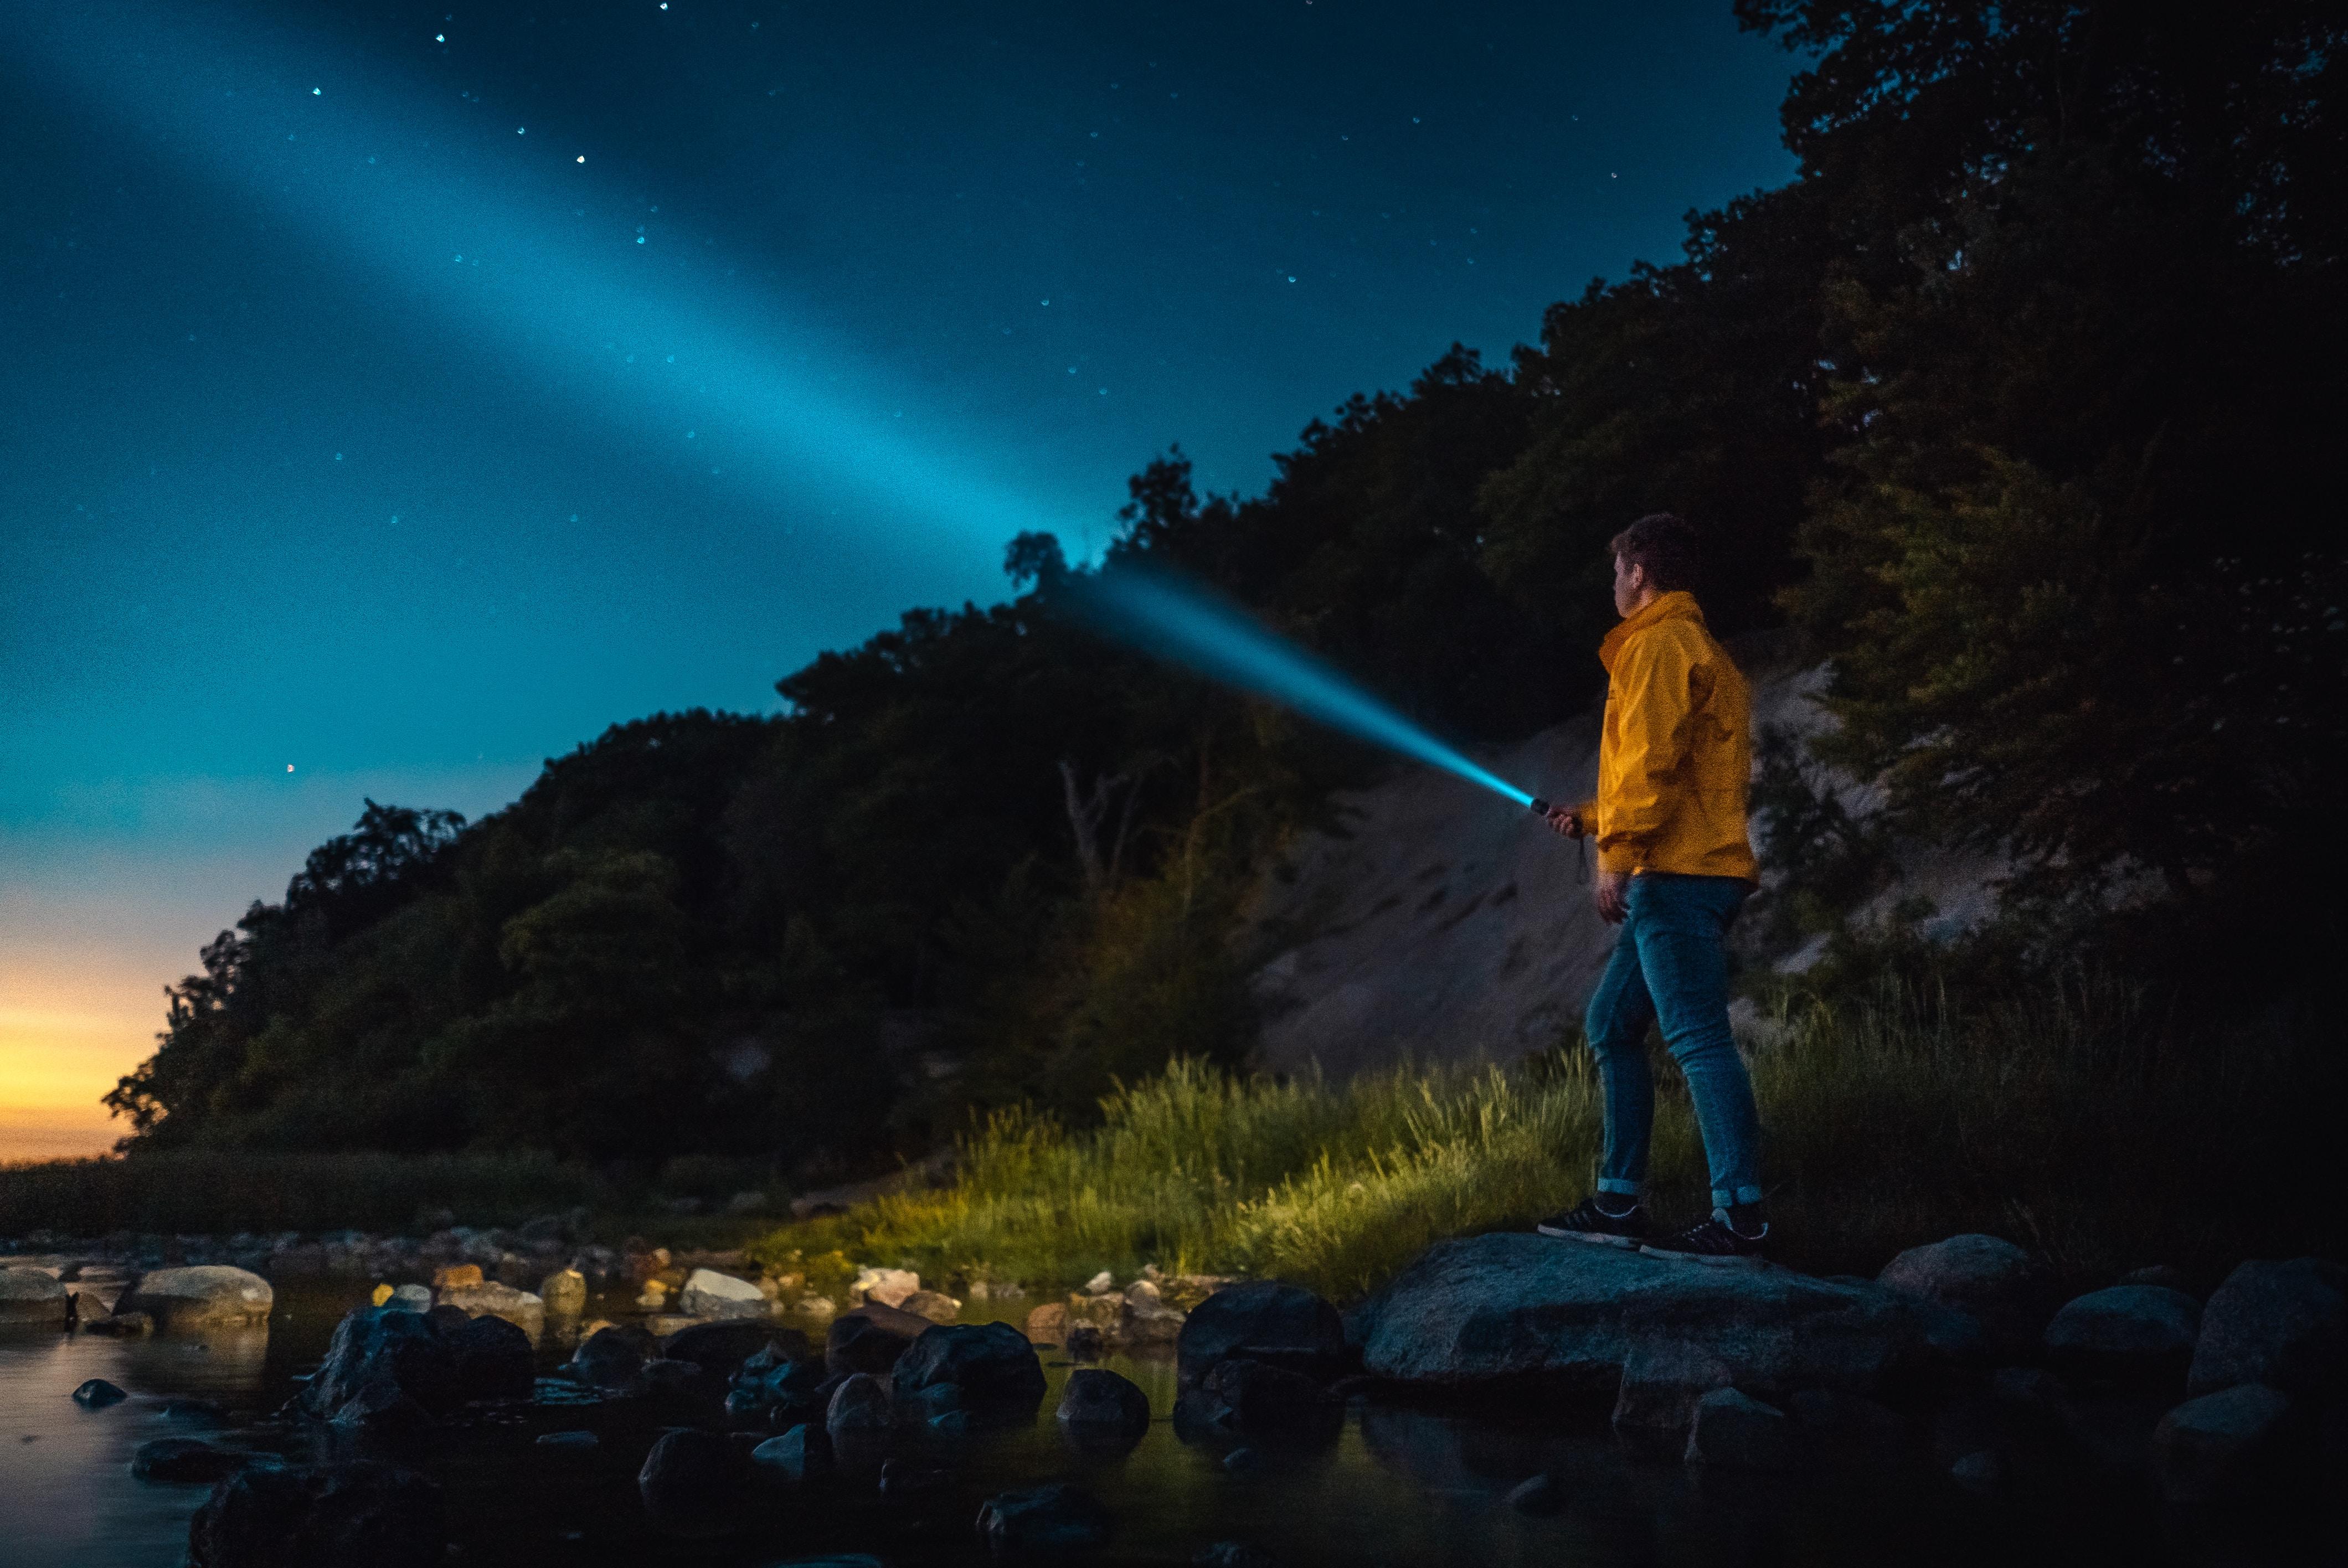 man holding flashlight standing on gray stone during nighttime